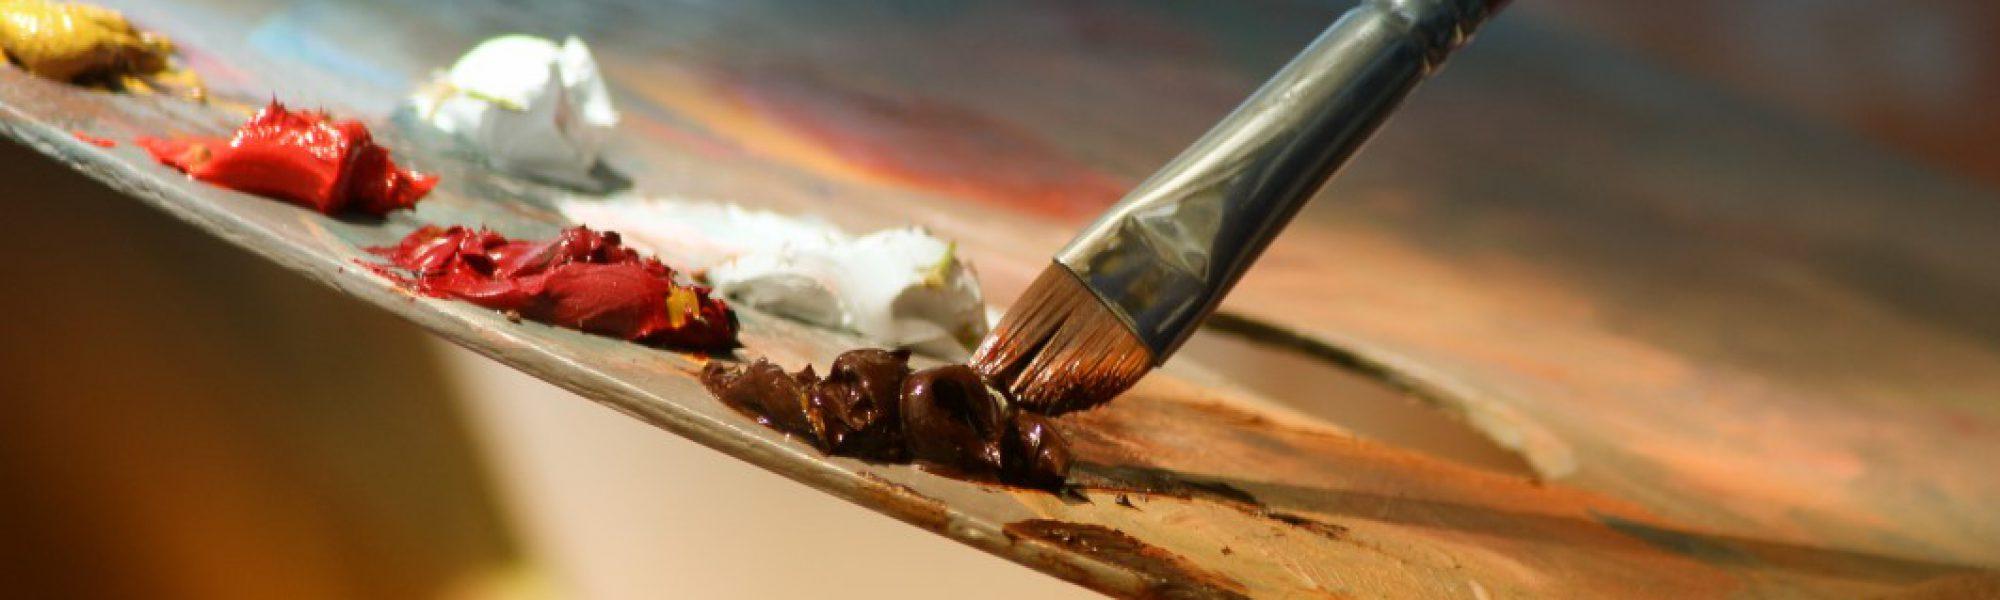 negative-space-artist-easel-color-paint-daian-gan-thumb-1